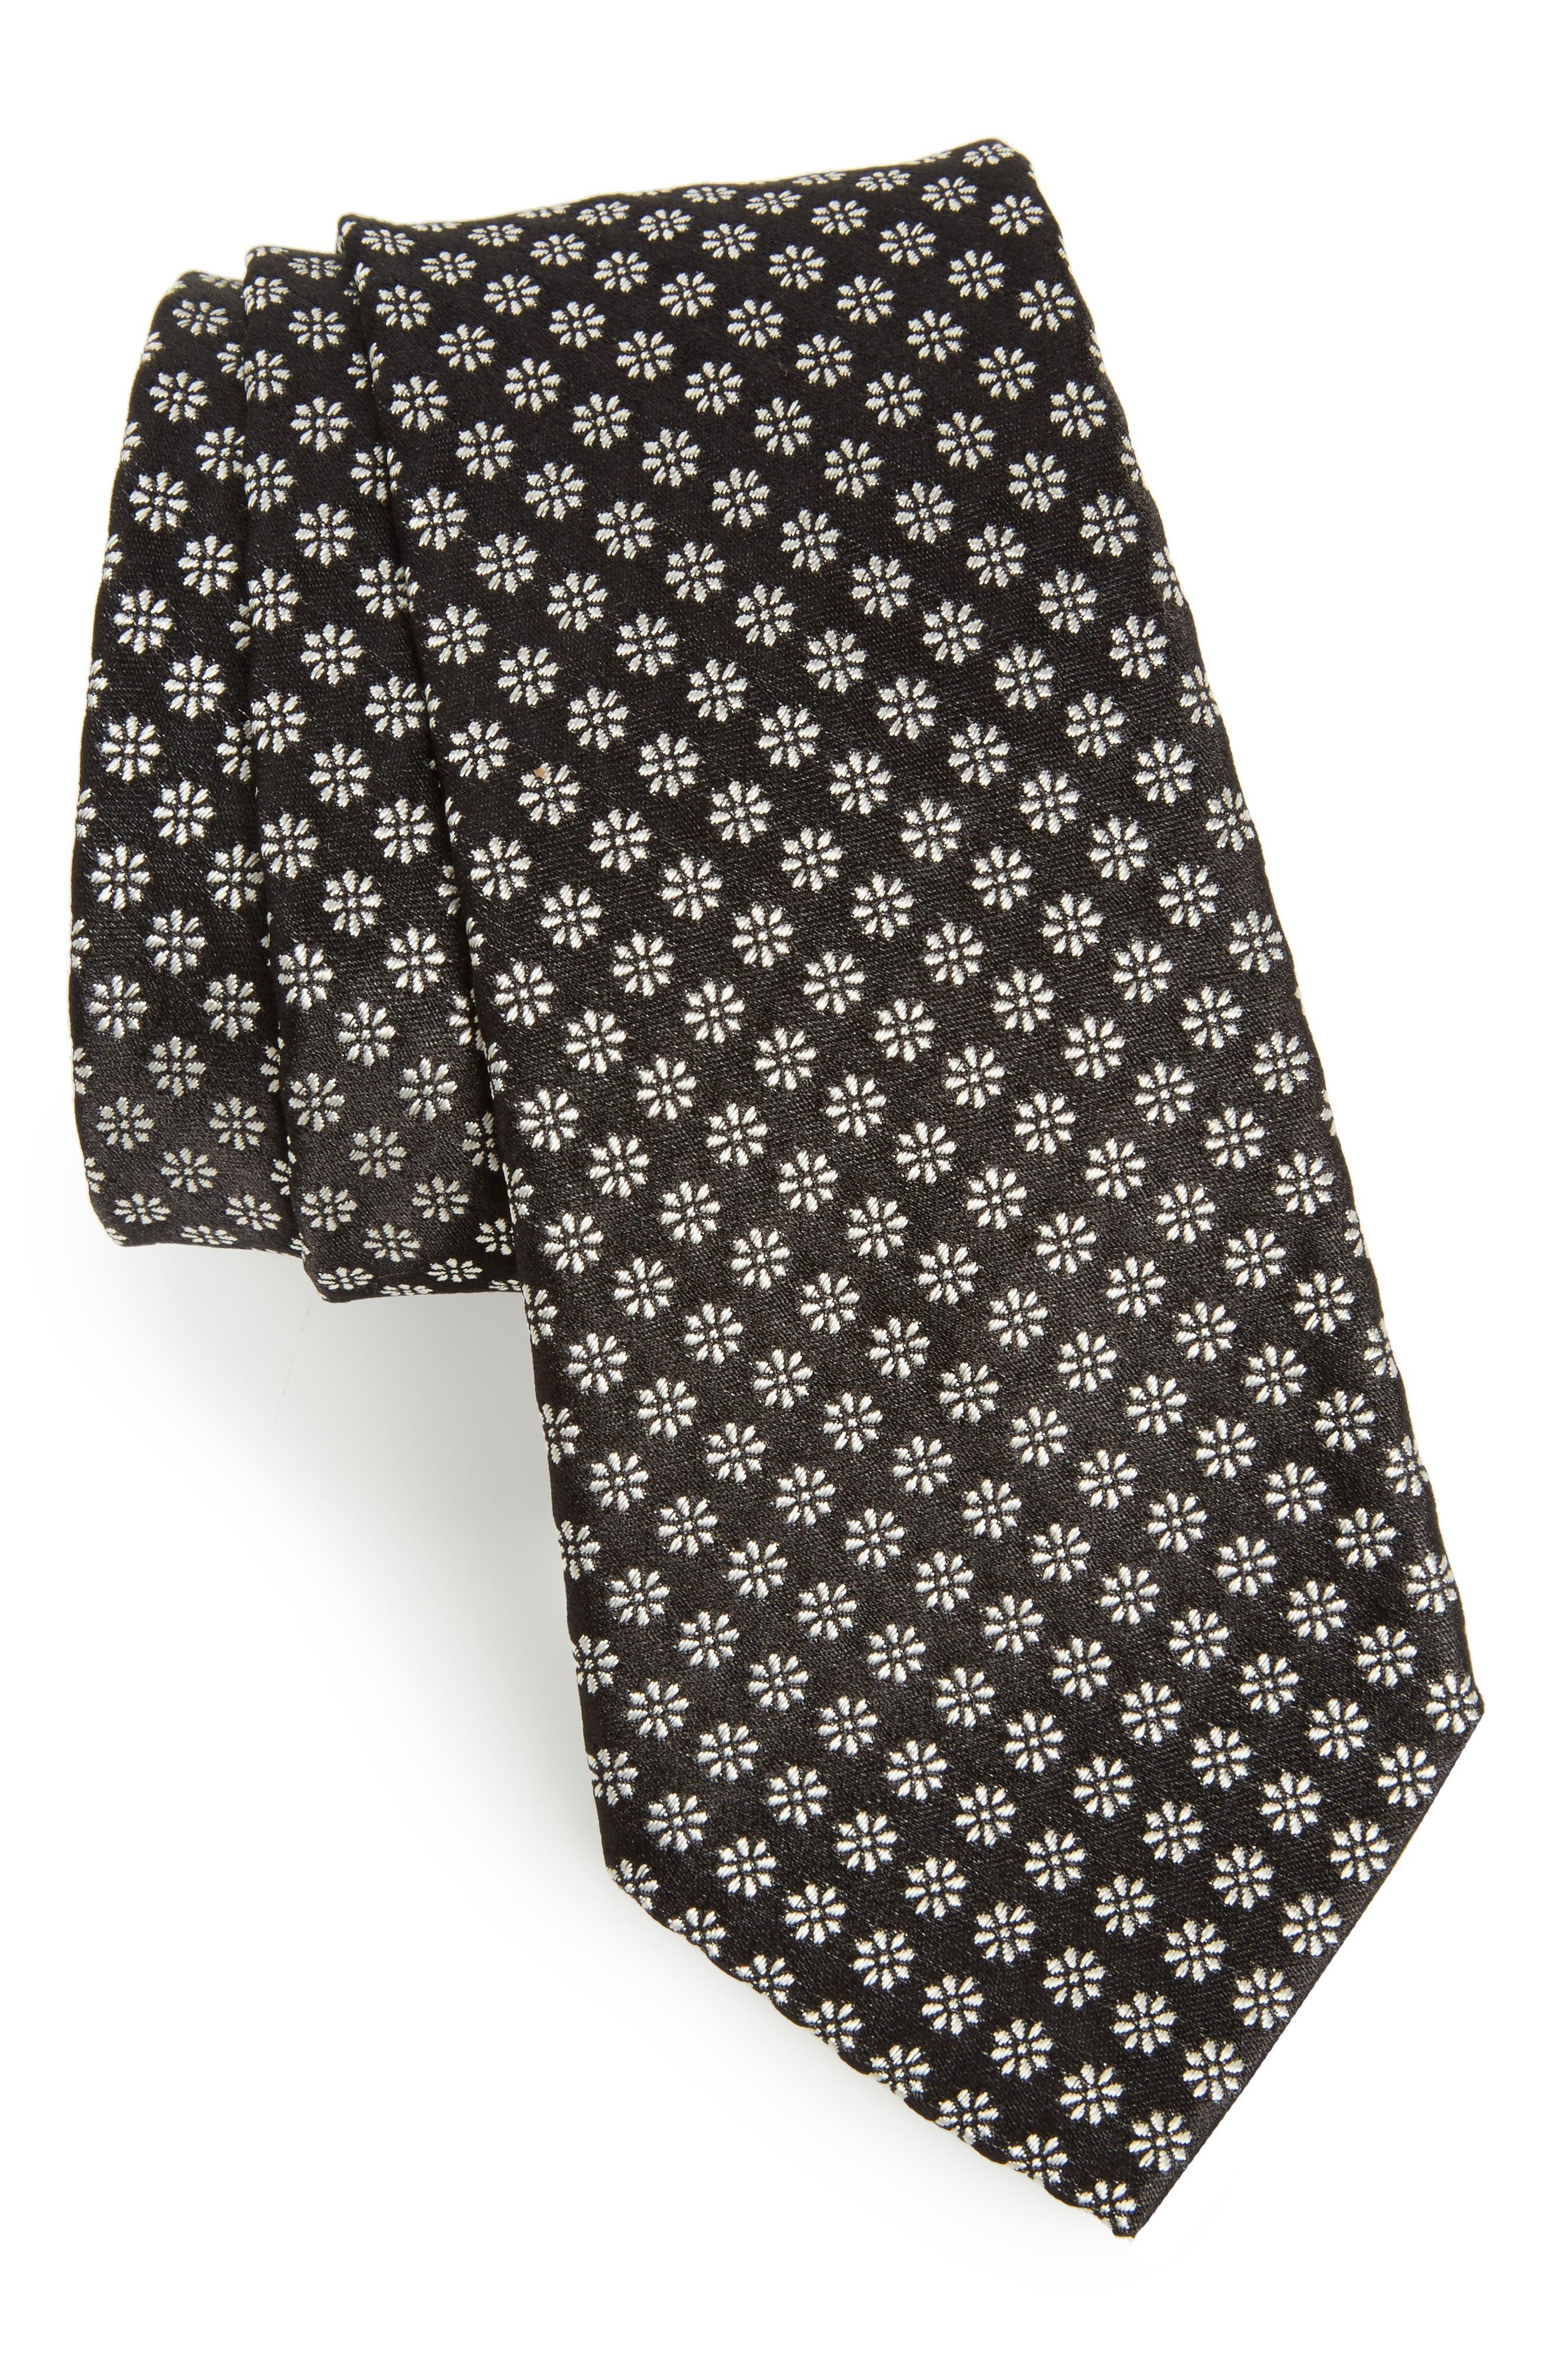 Main Image - Paul Smith Floral Print Skinny Tie